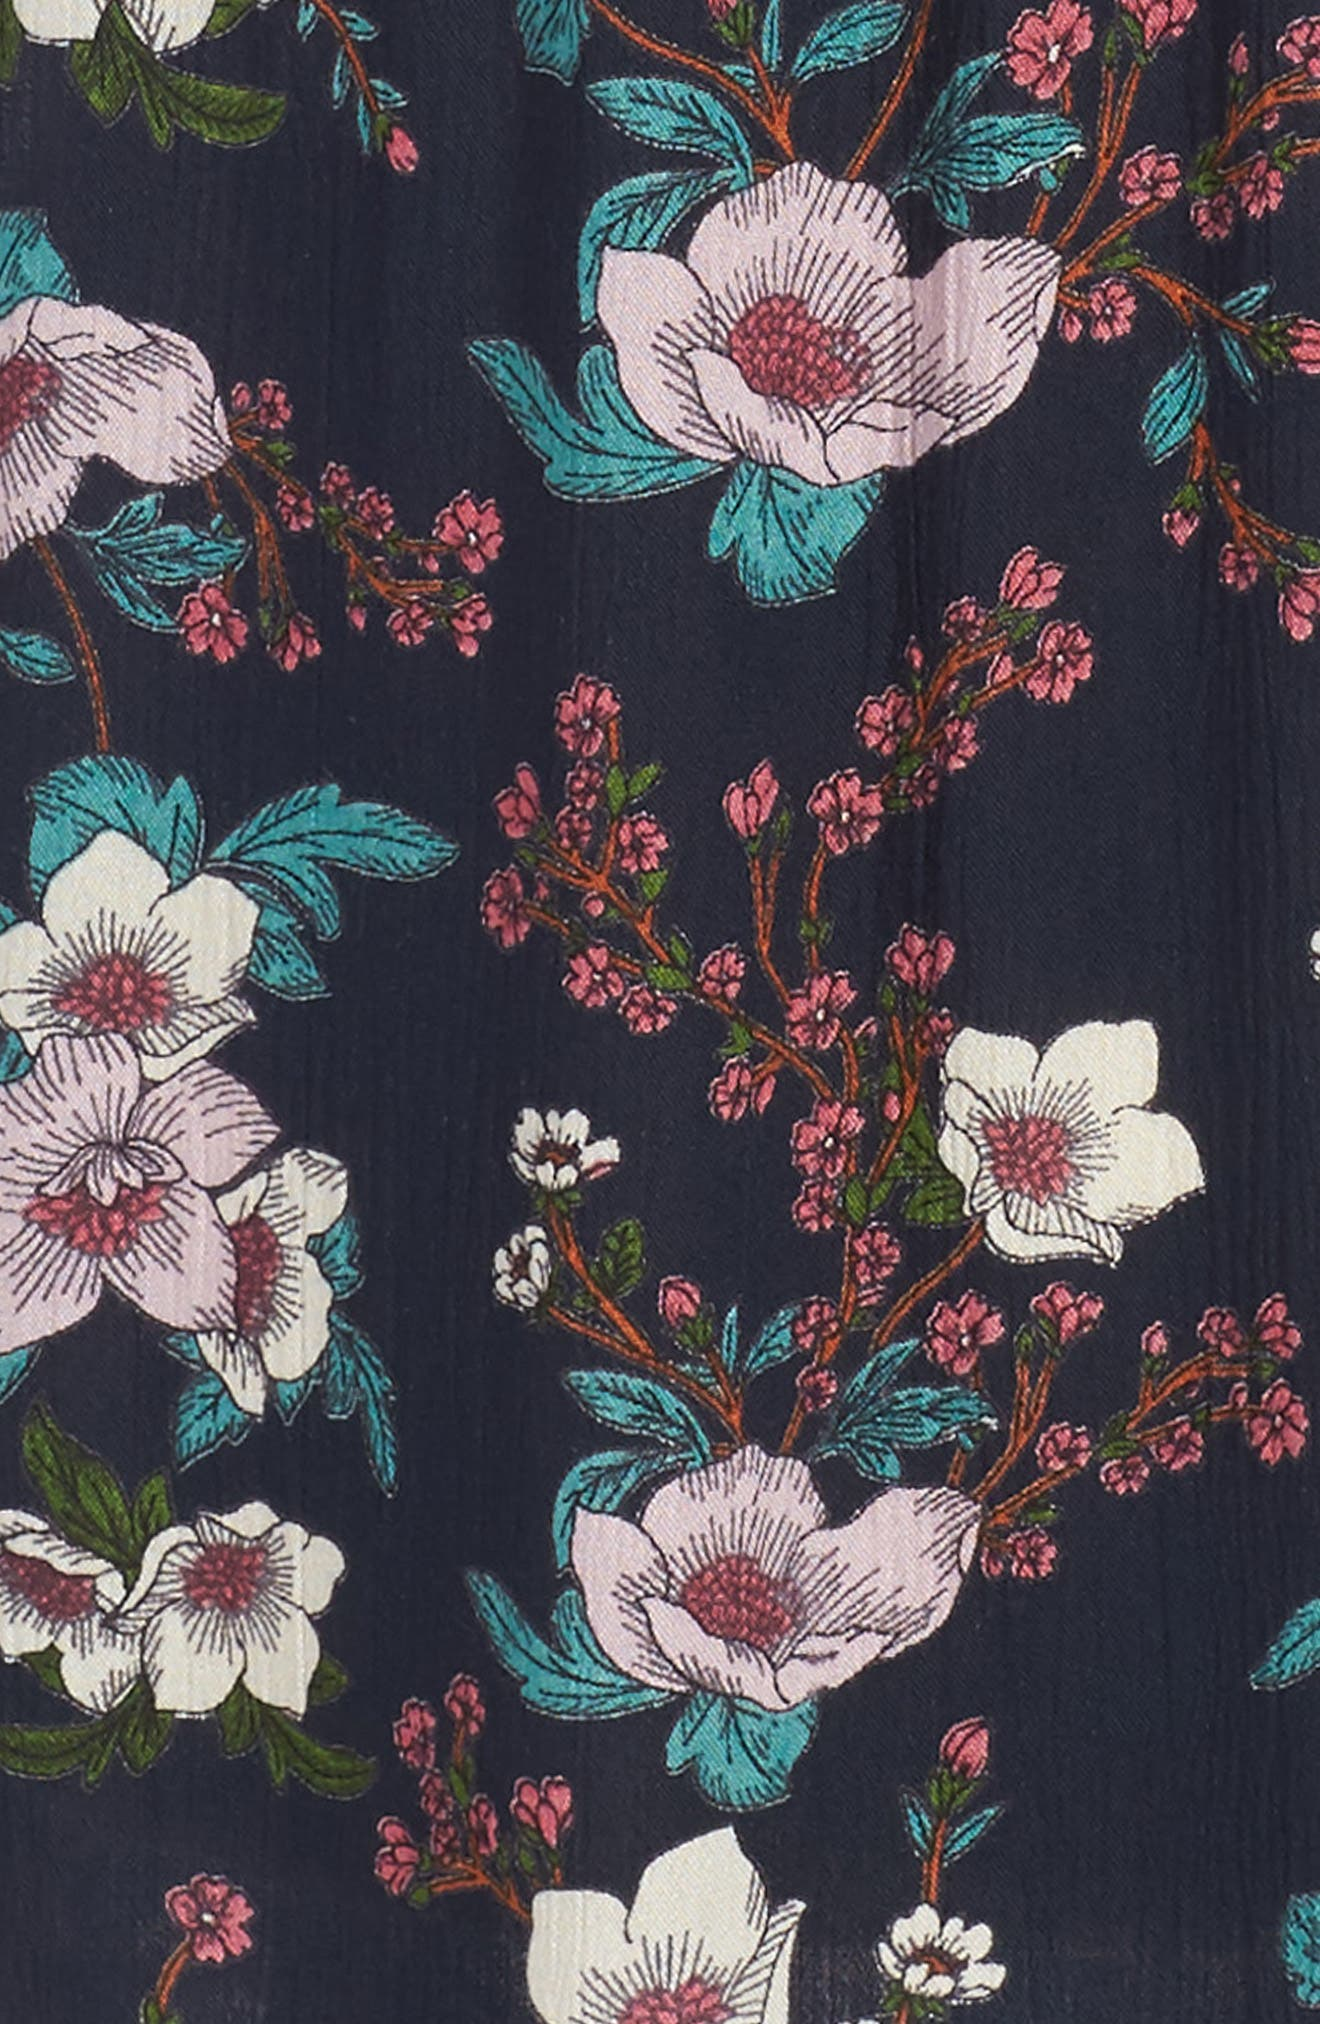 Zoe & Rose Crochet Inset Floral Dress,                             Alternate thumbnail 3, color,                             499